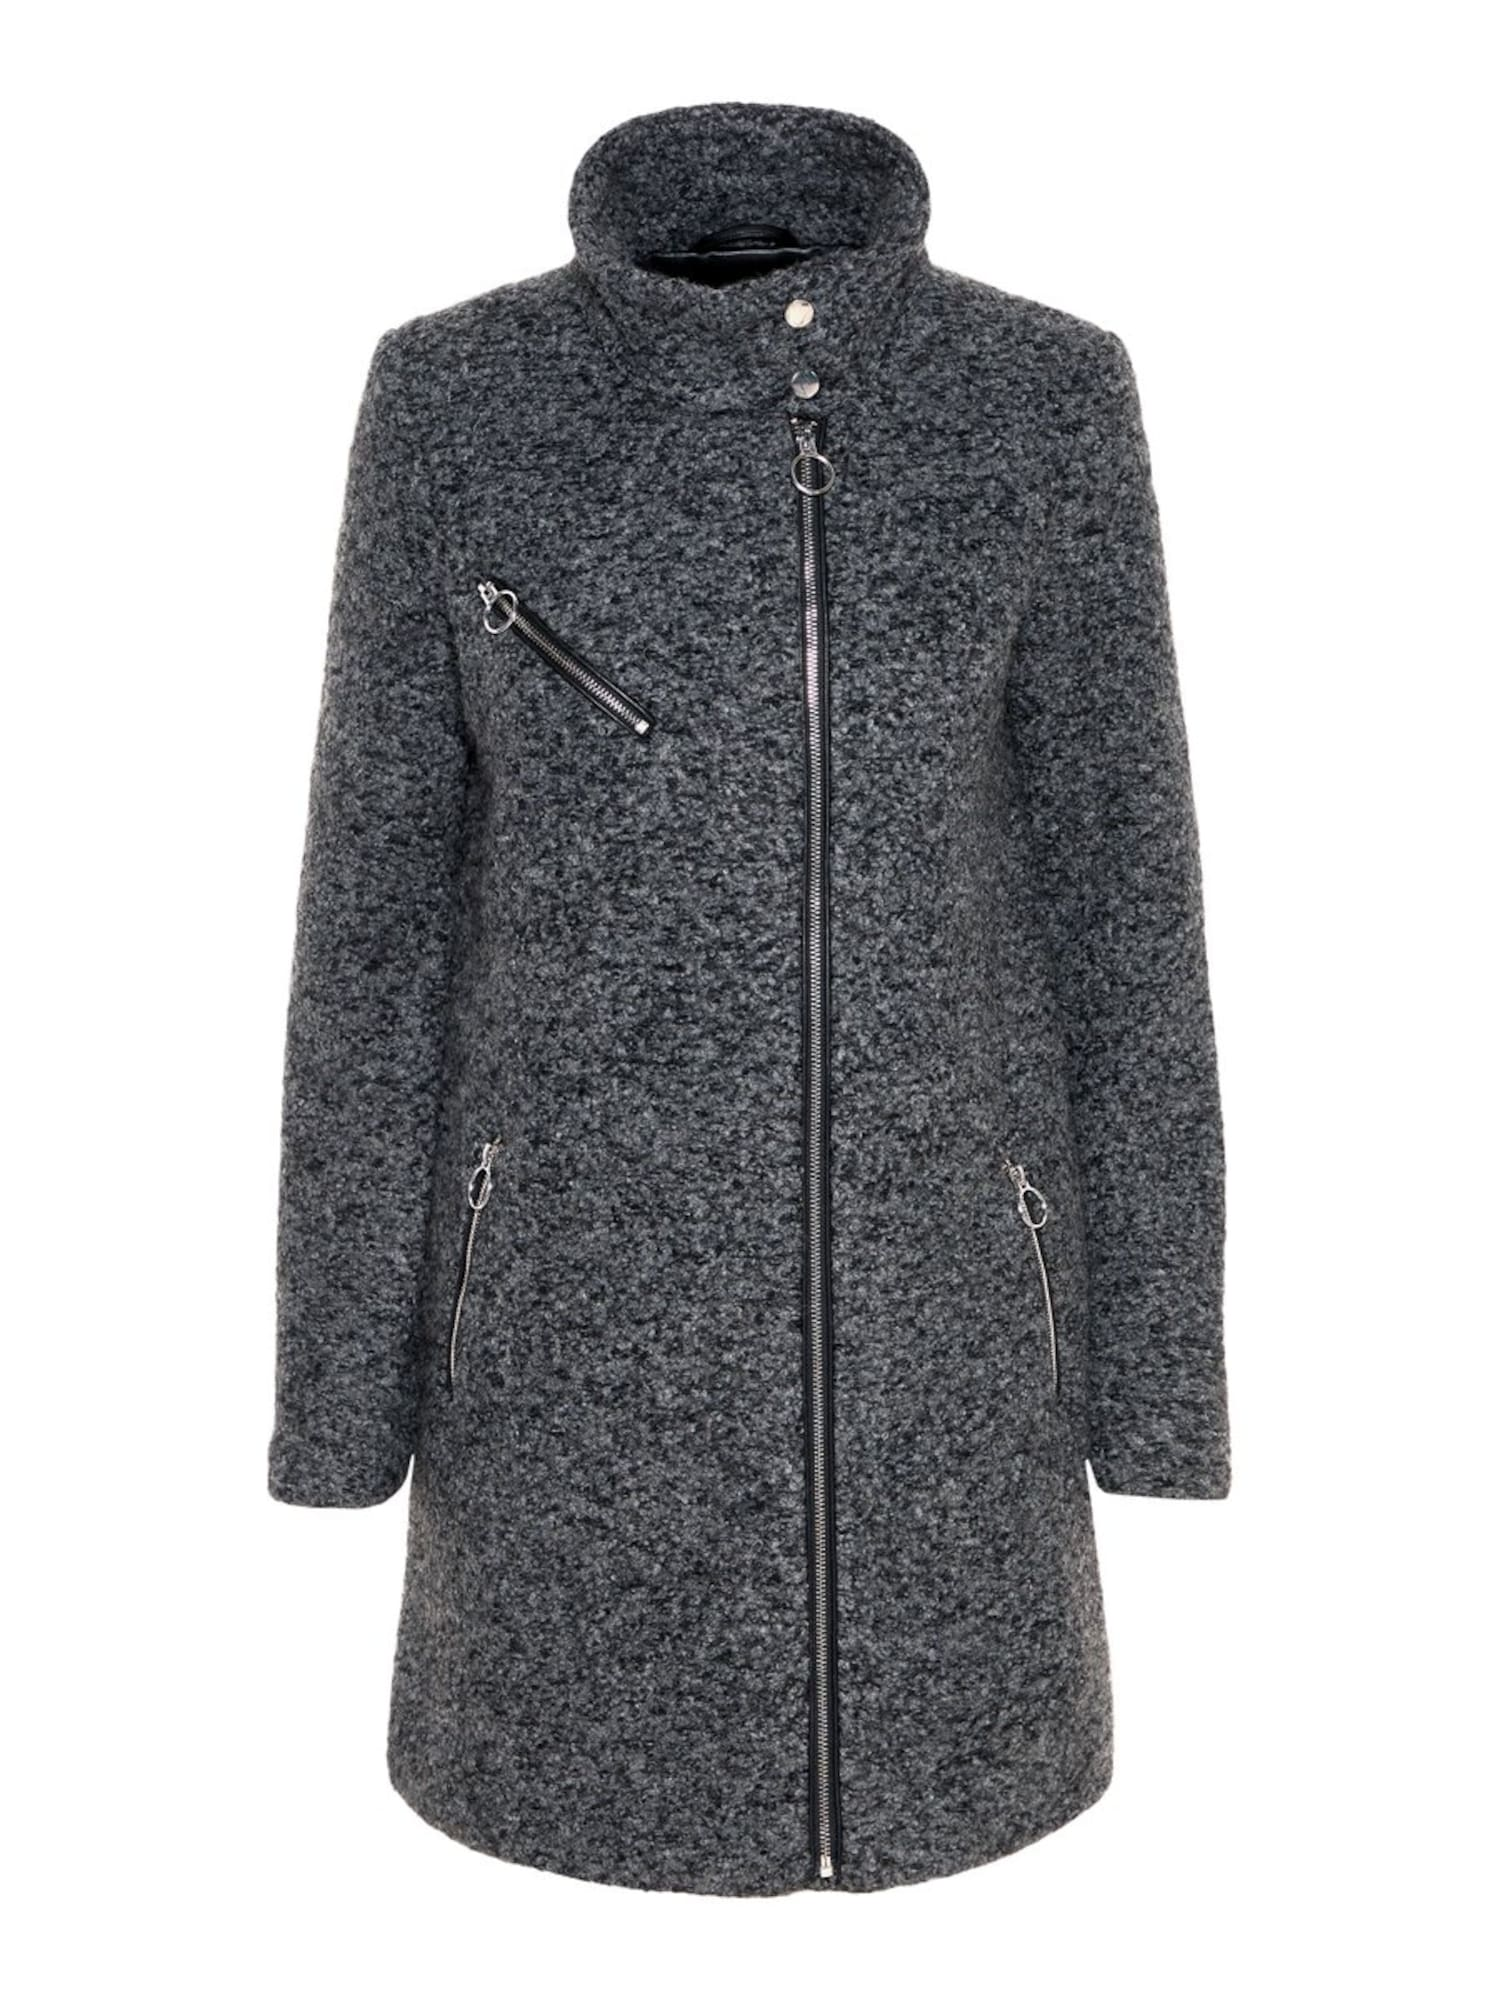 Zimní kabát šedý melír VERO MODA